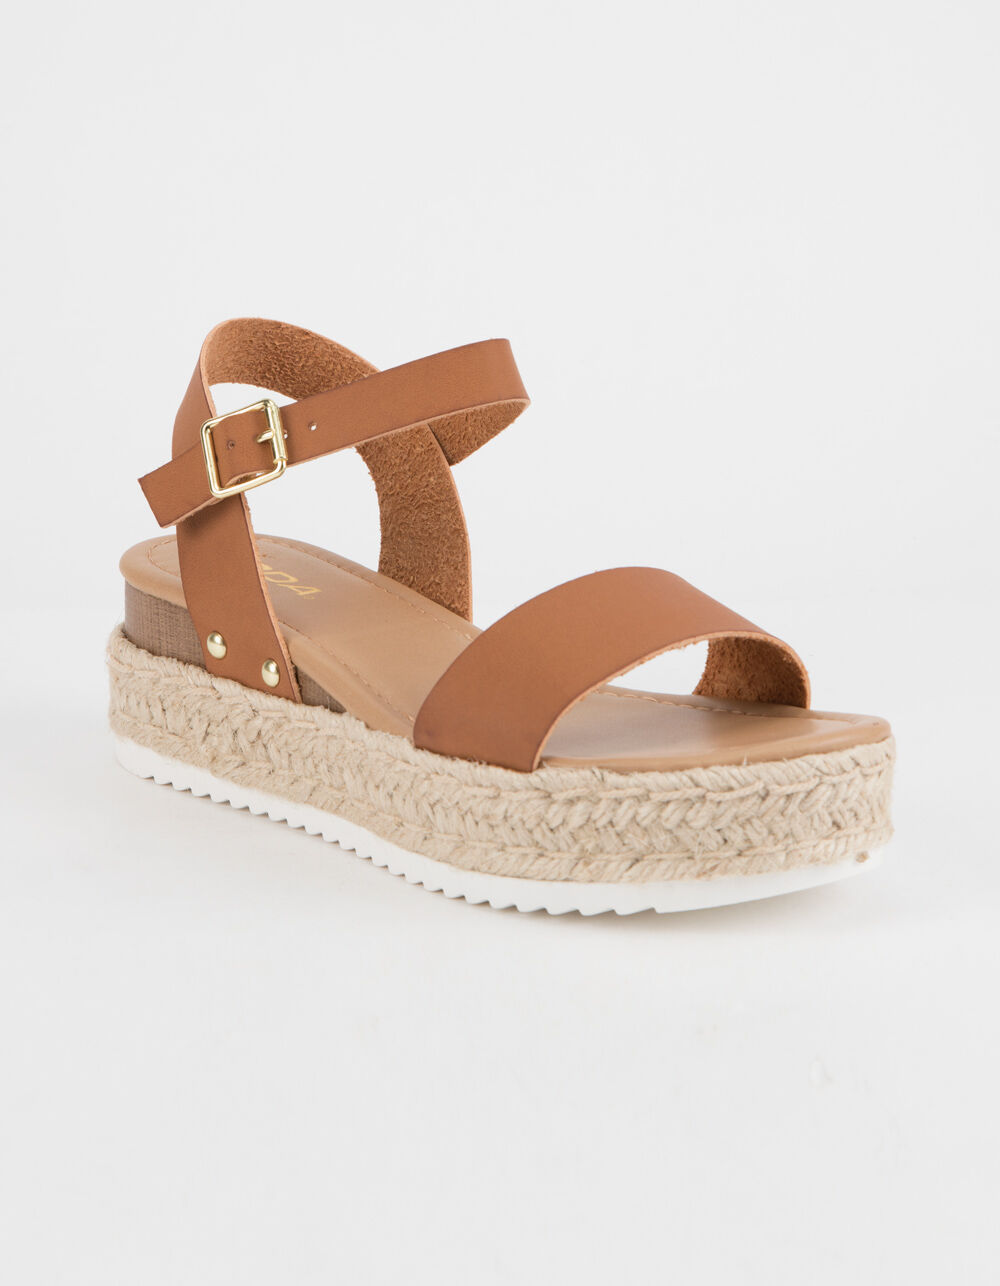 SODA Clip Tan Espadrille Flatform Sandals